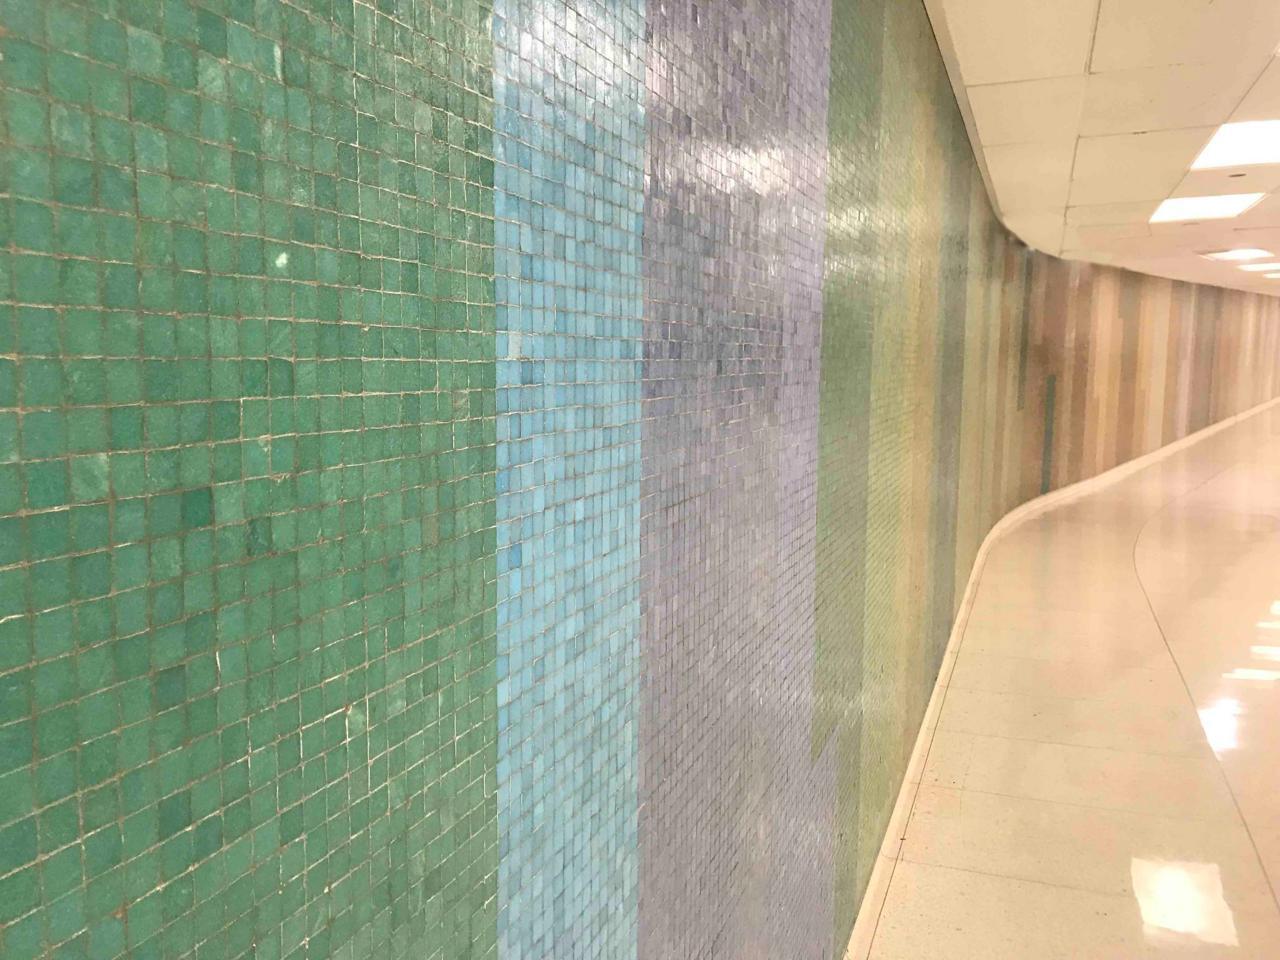 5. LAX tunnel